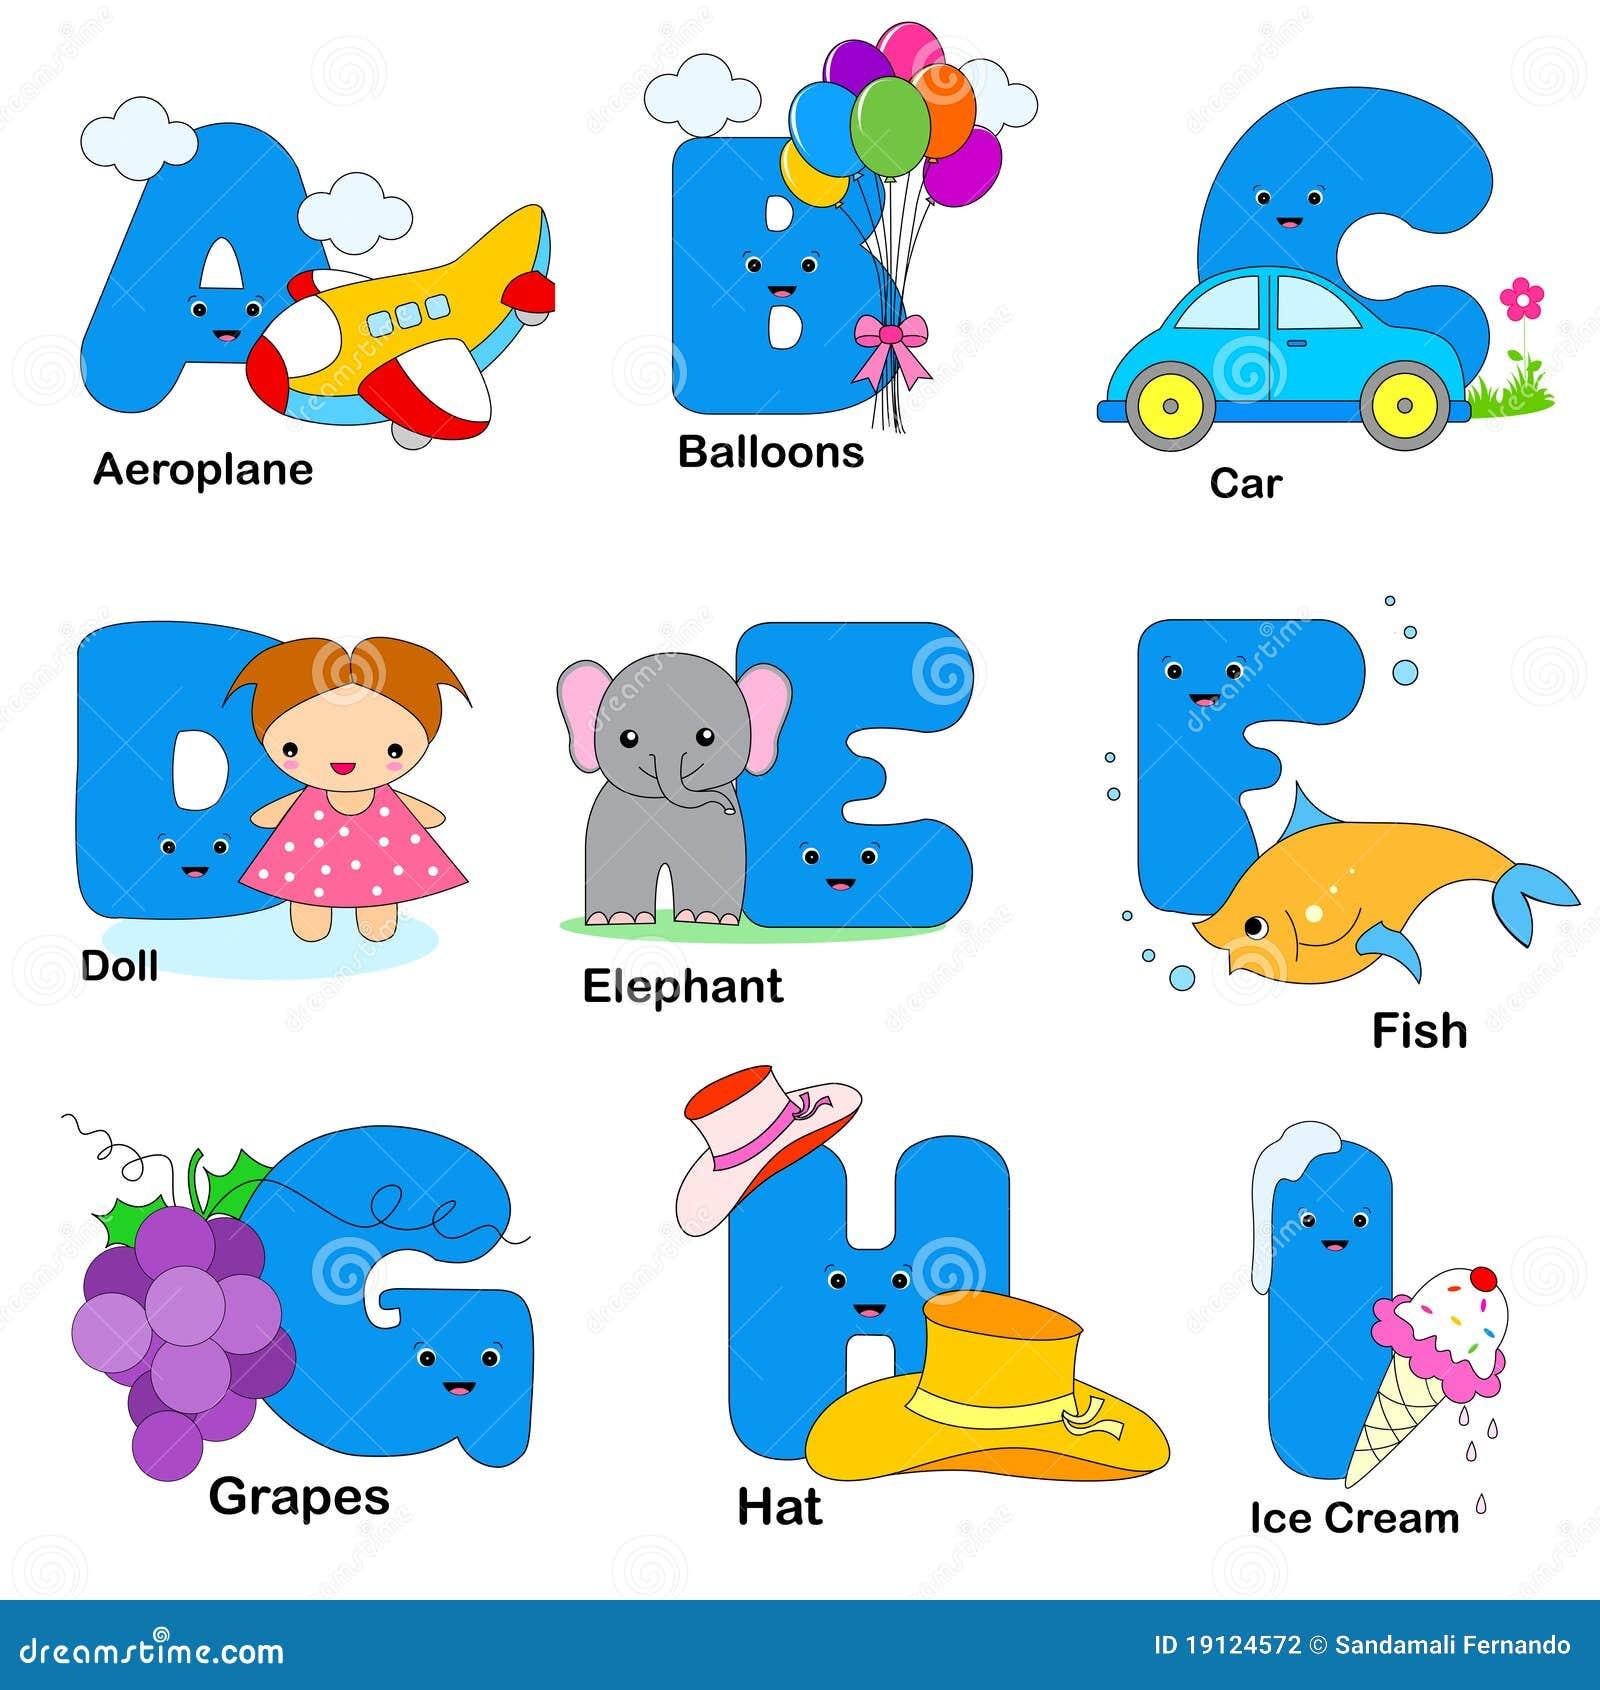 Worksheet Alphabet Letter alphabet letters stock photography image 19124572 letters